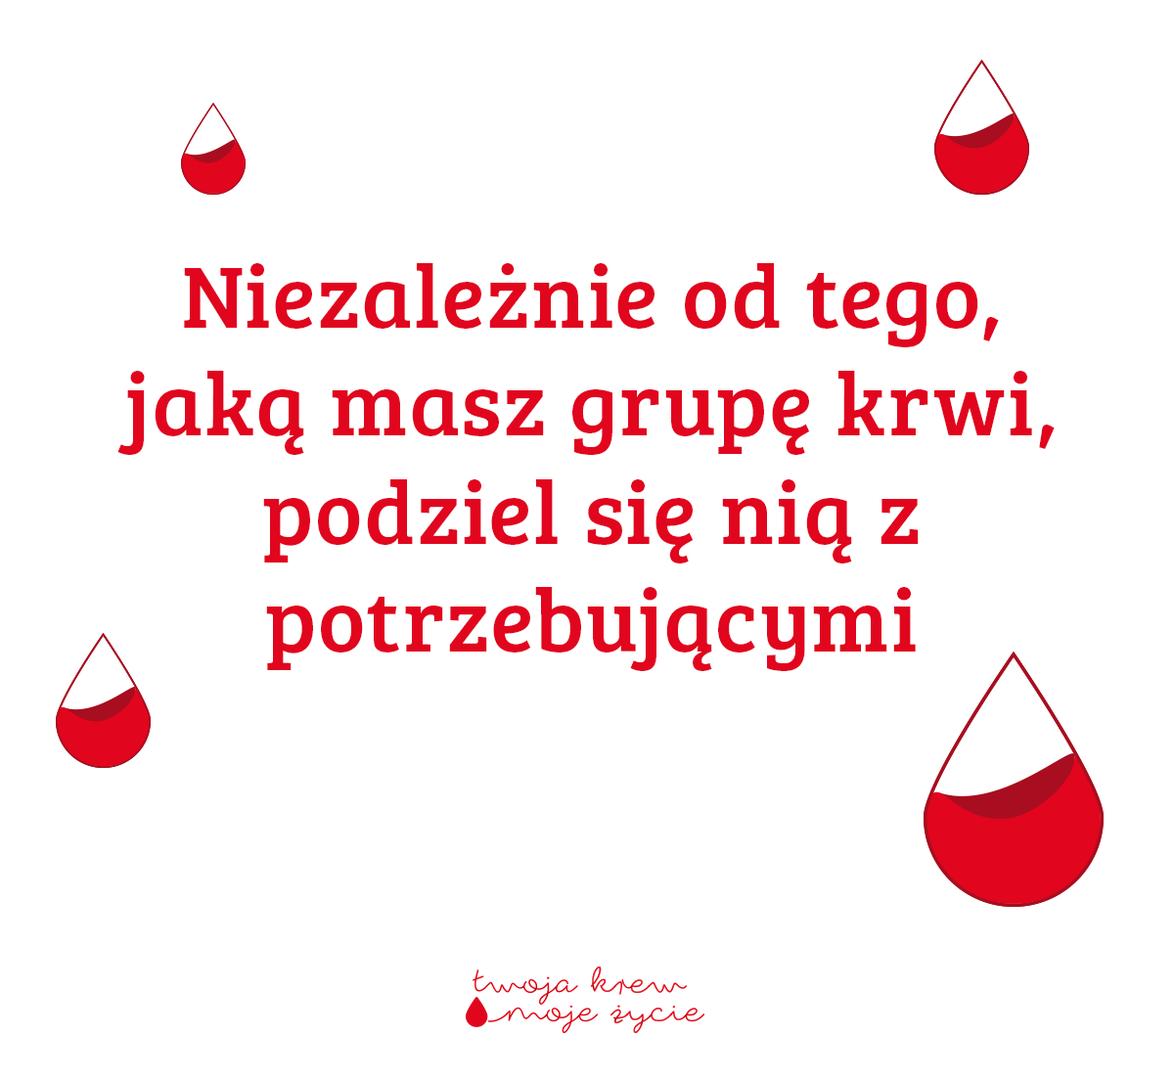 krew.png